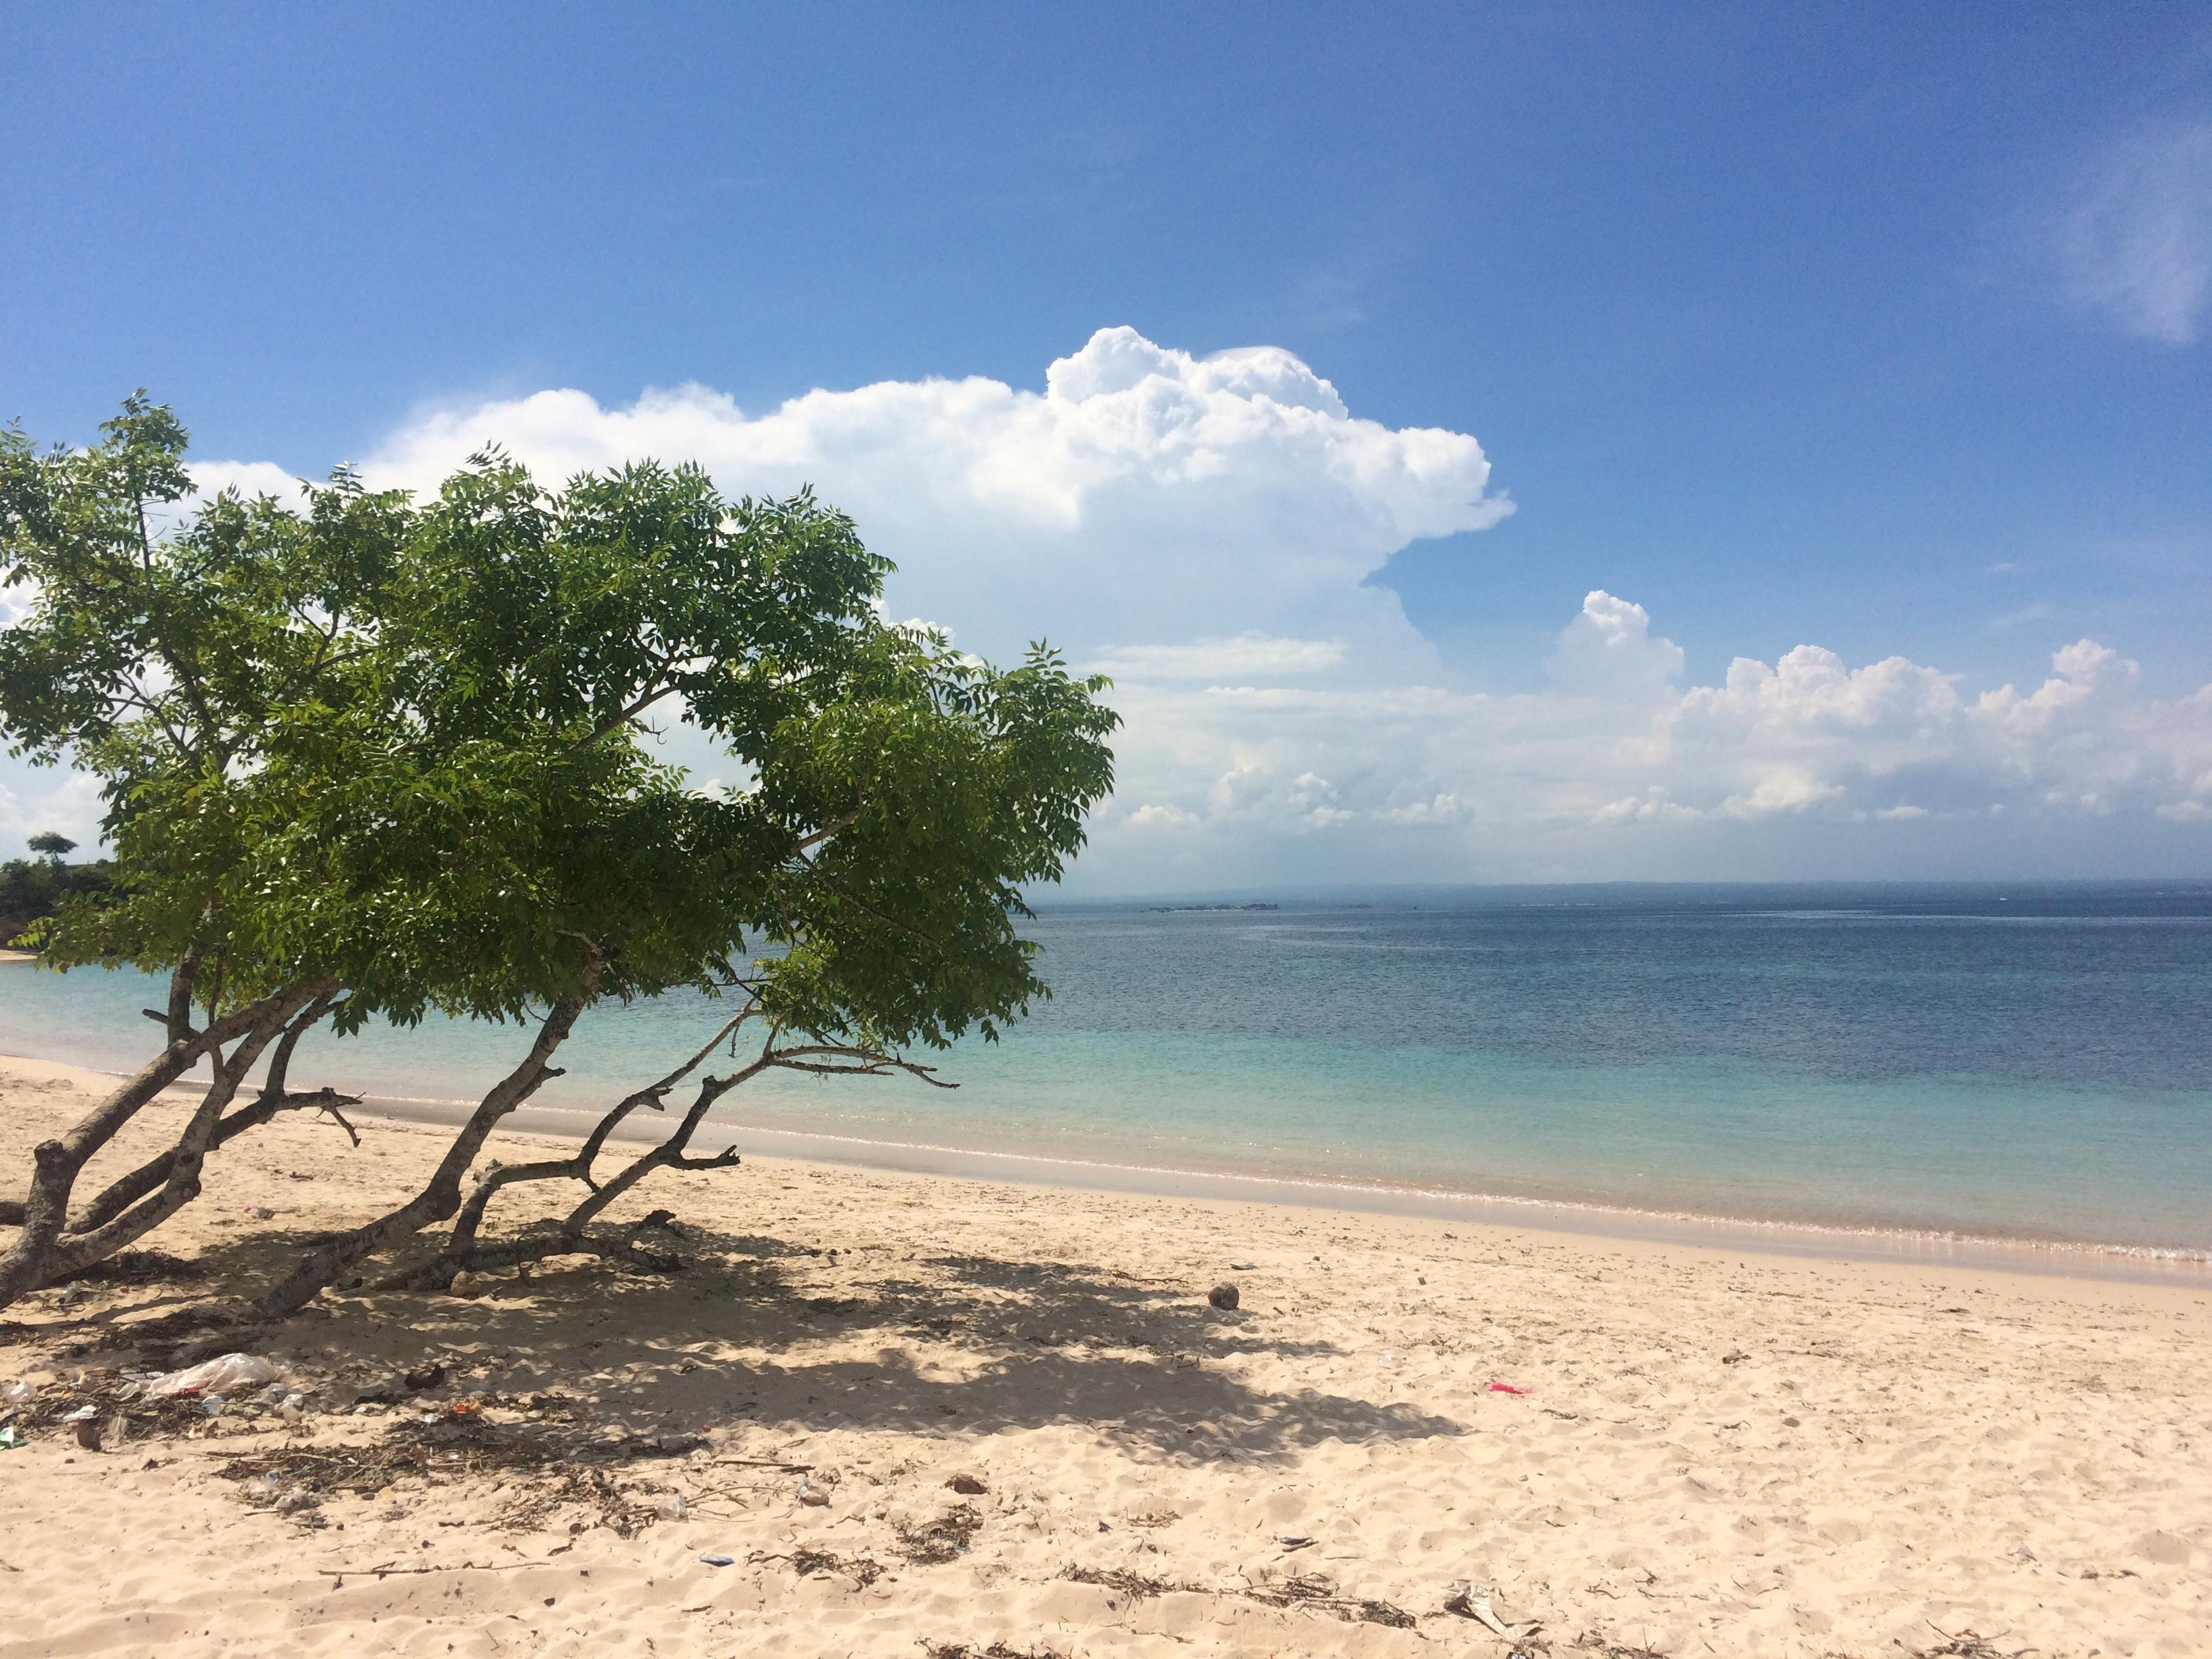 Plage de sable rose, Pink Beach, Lombok, Indonésie.